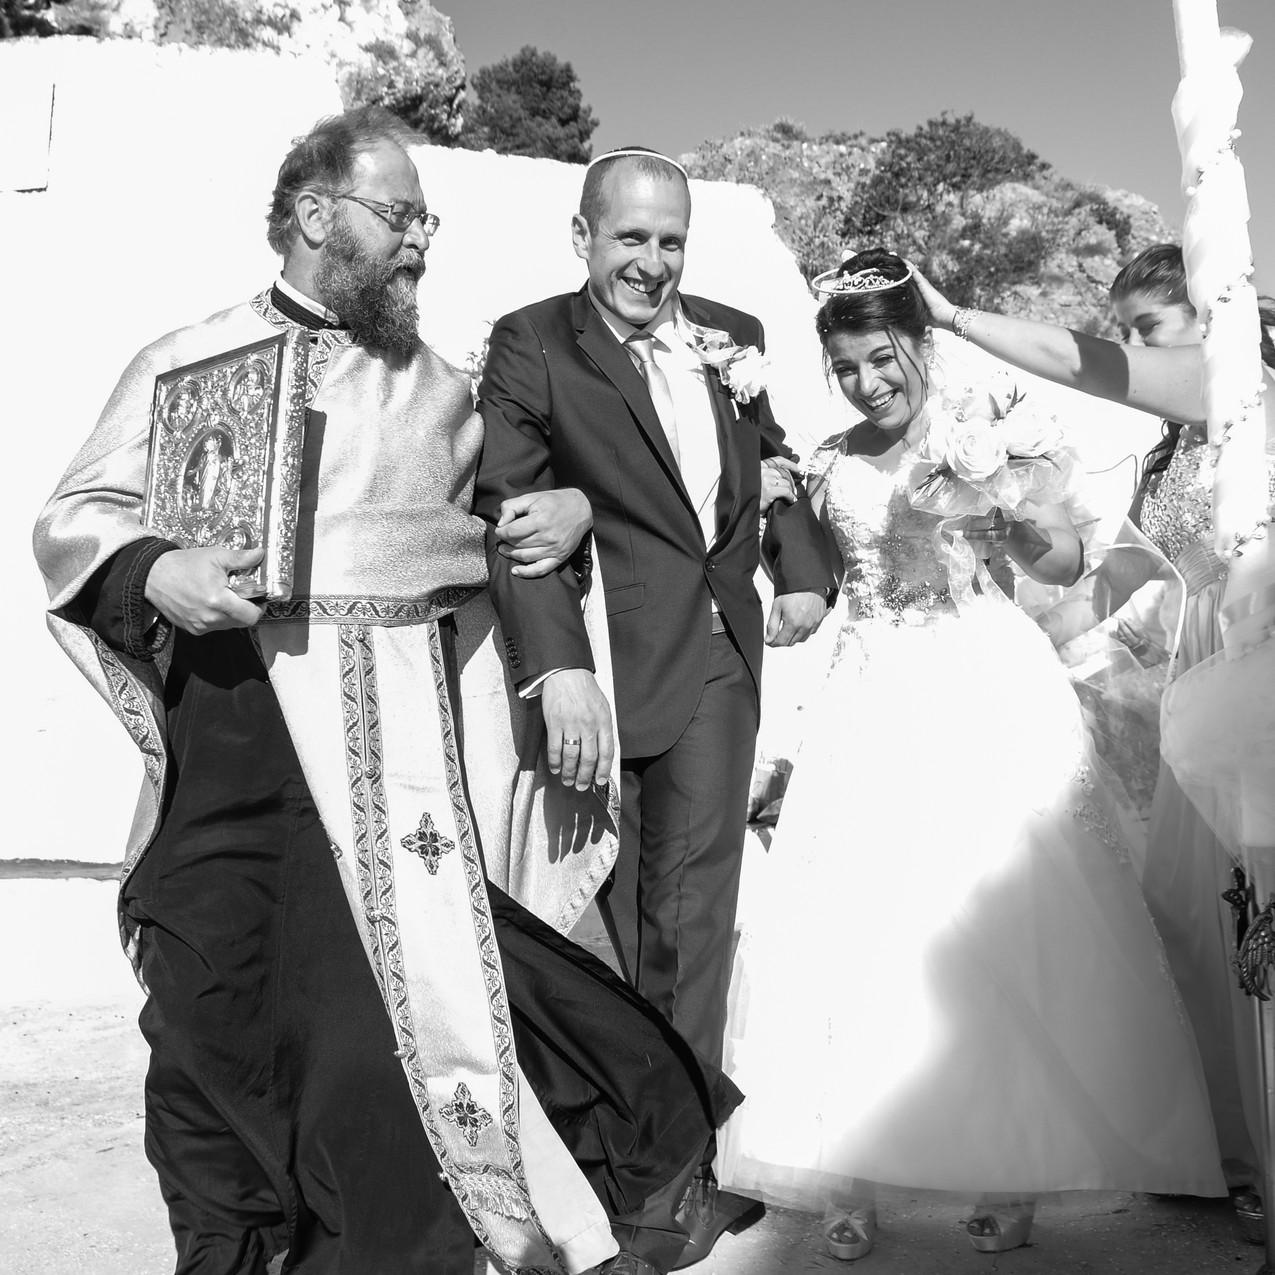 Priest leading the ceremonial walk